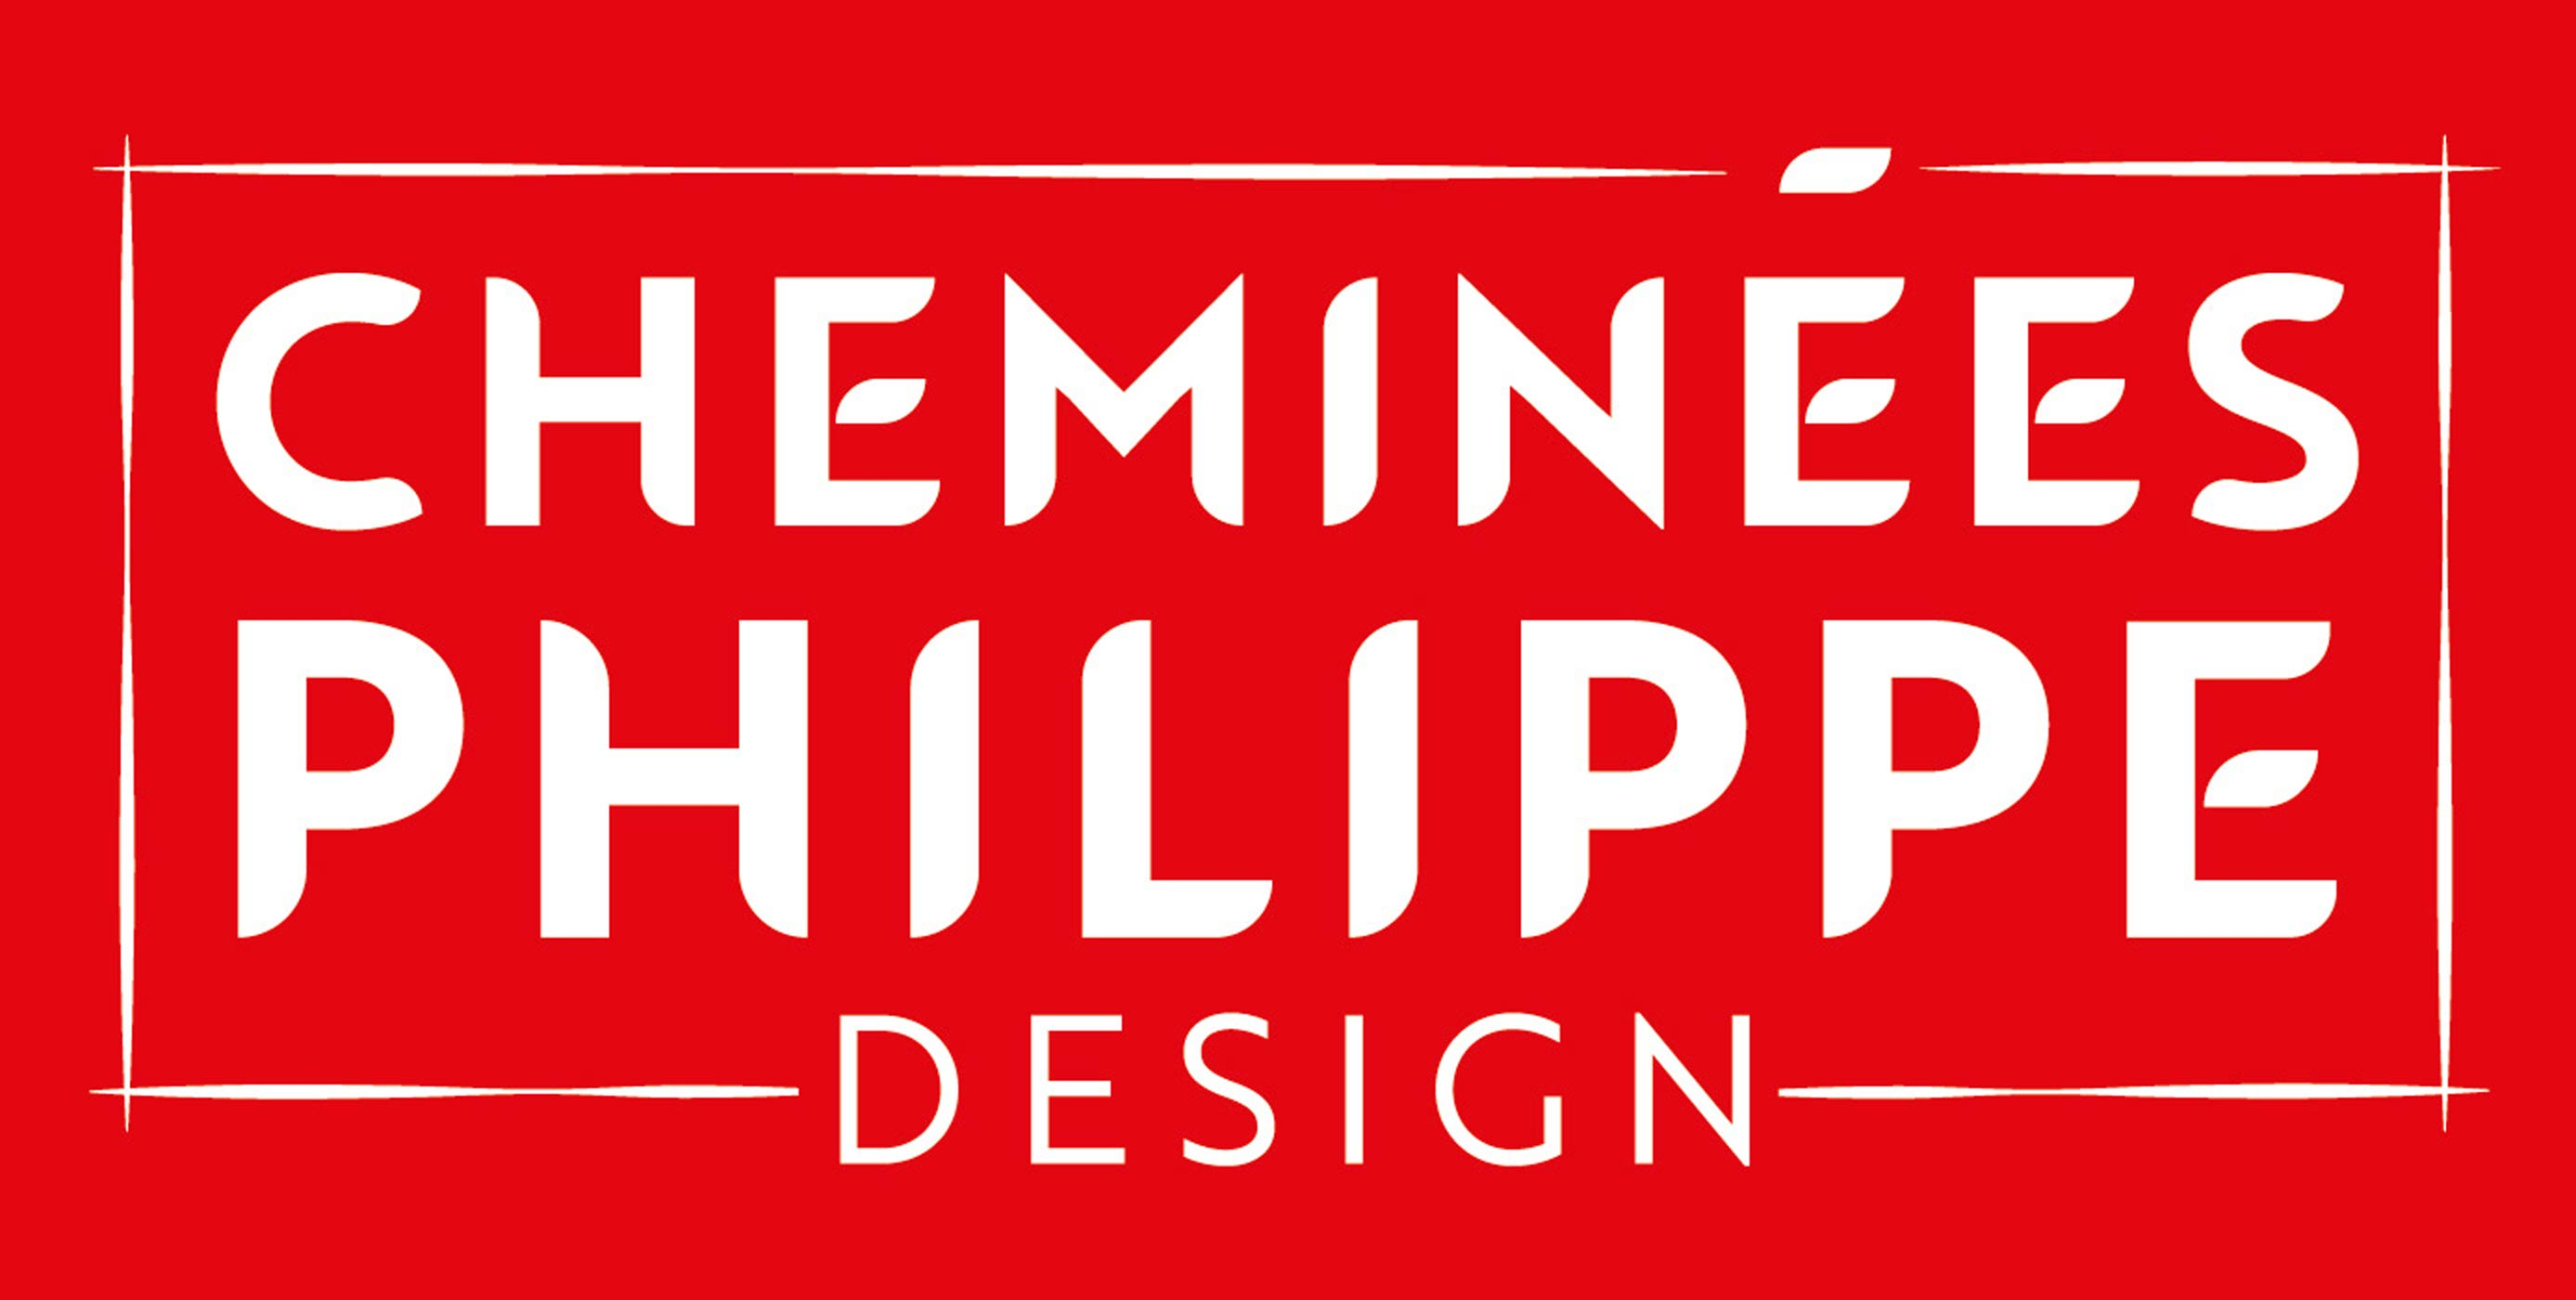 Logo_Cheminees_Philippe_Brest_retina